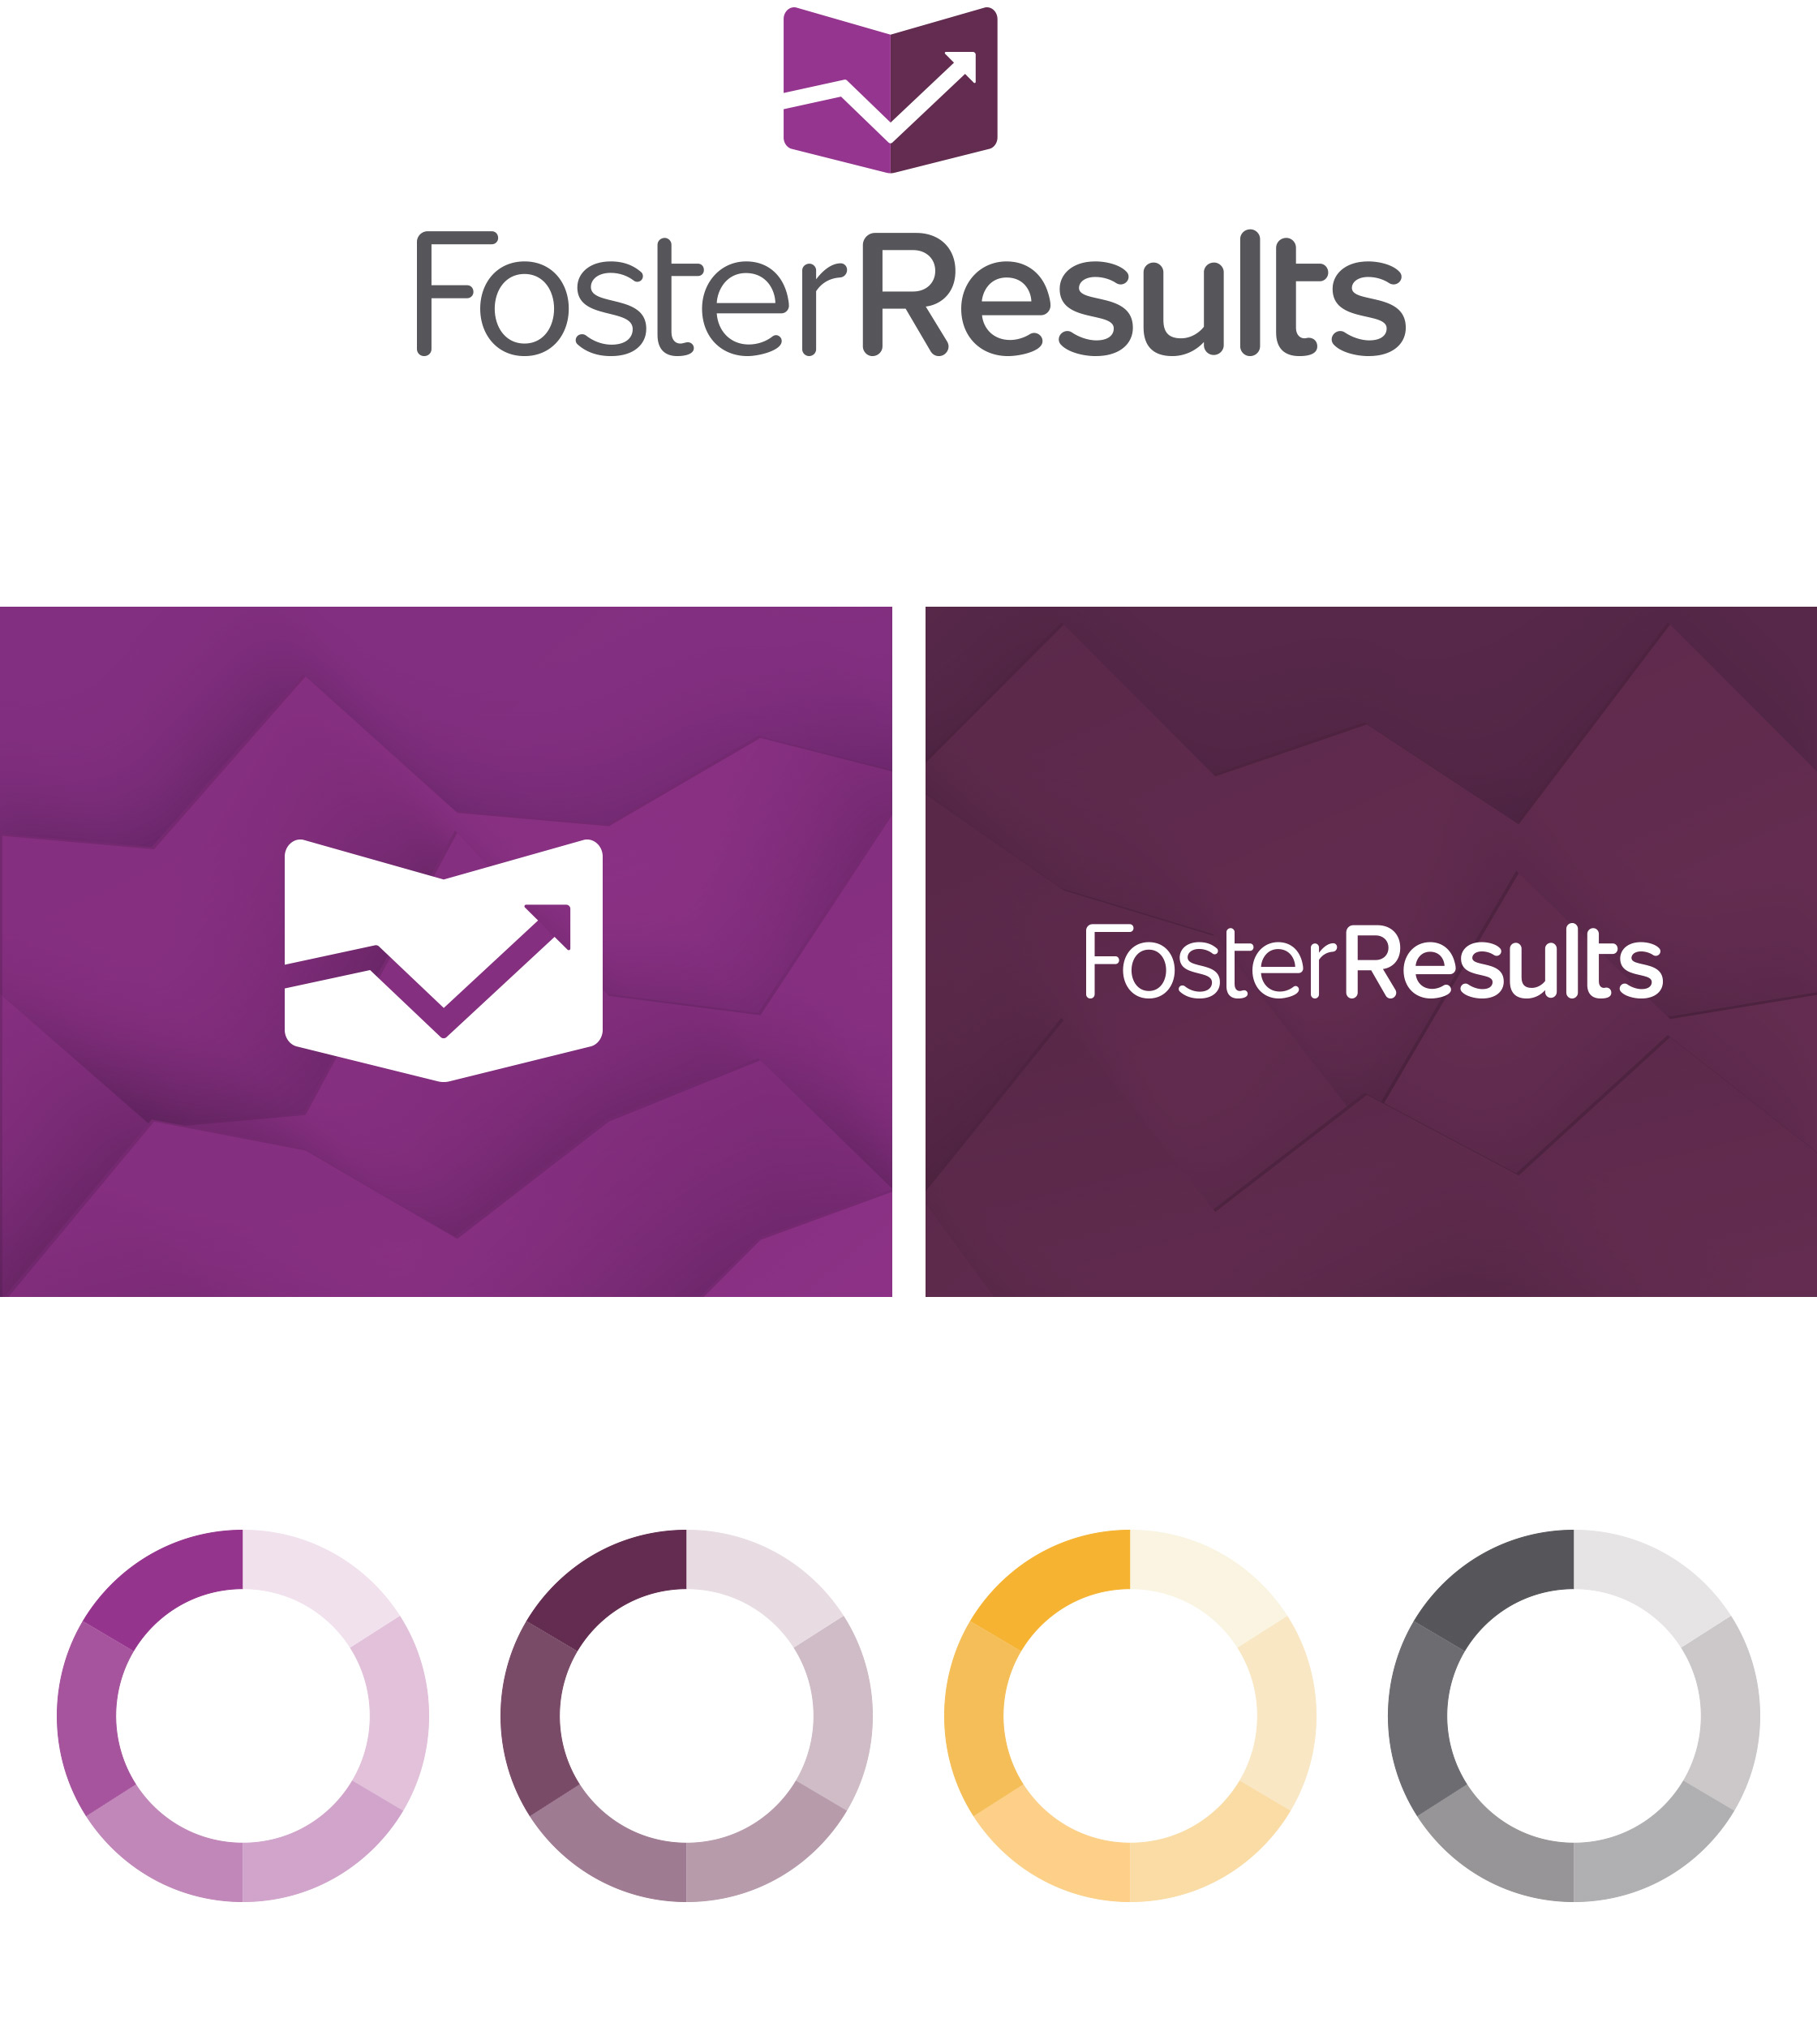 FosterResults_Branding